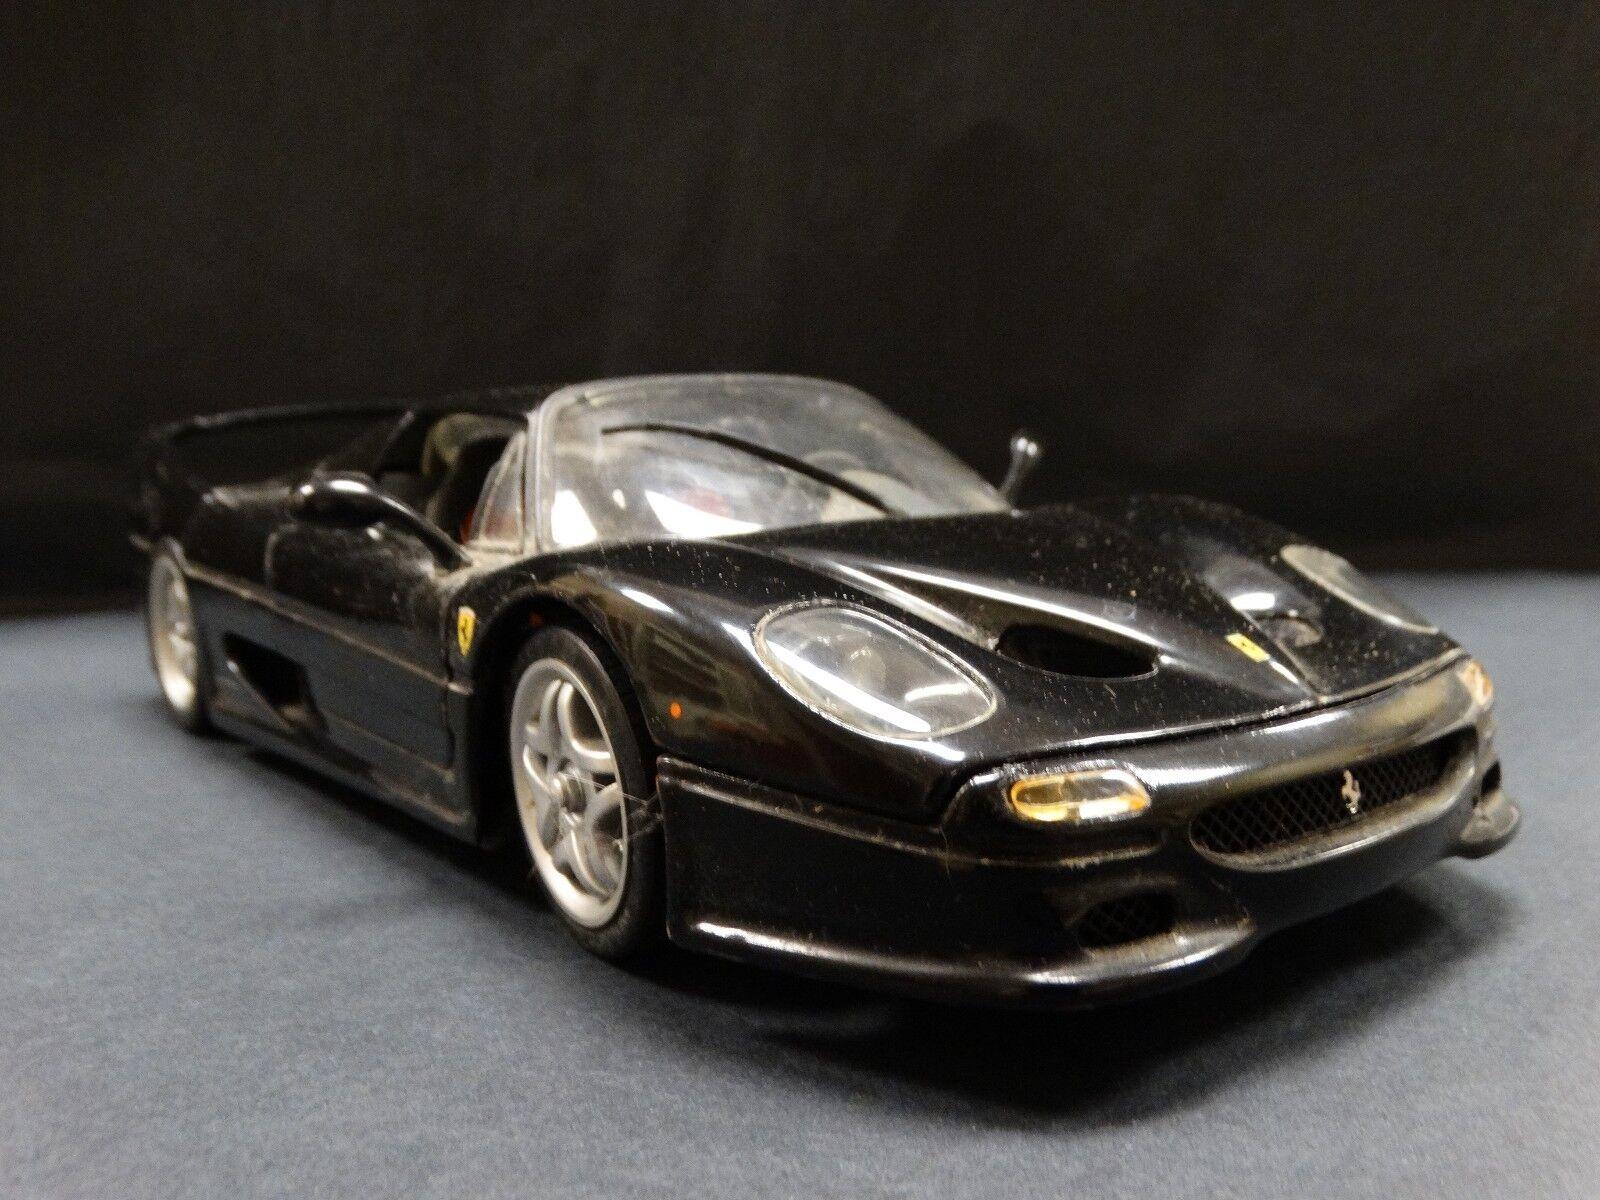 Hot Wheels Ferrari F50 2018 Raro Negro  escala Diecast Modelo de Coche